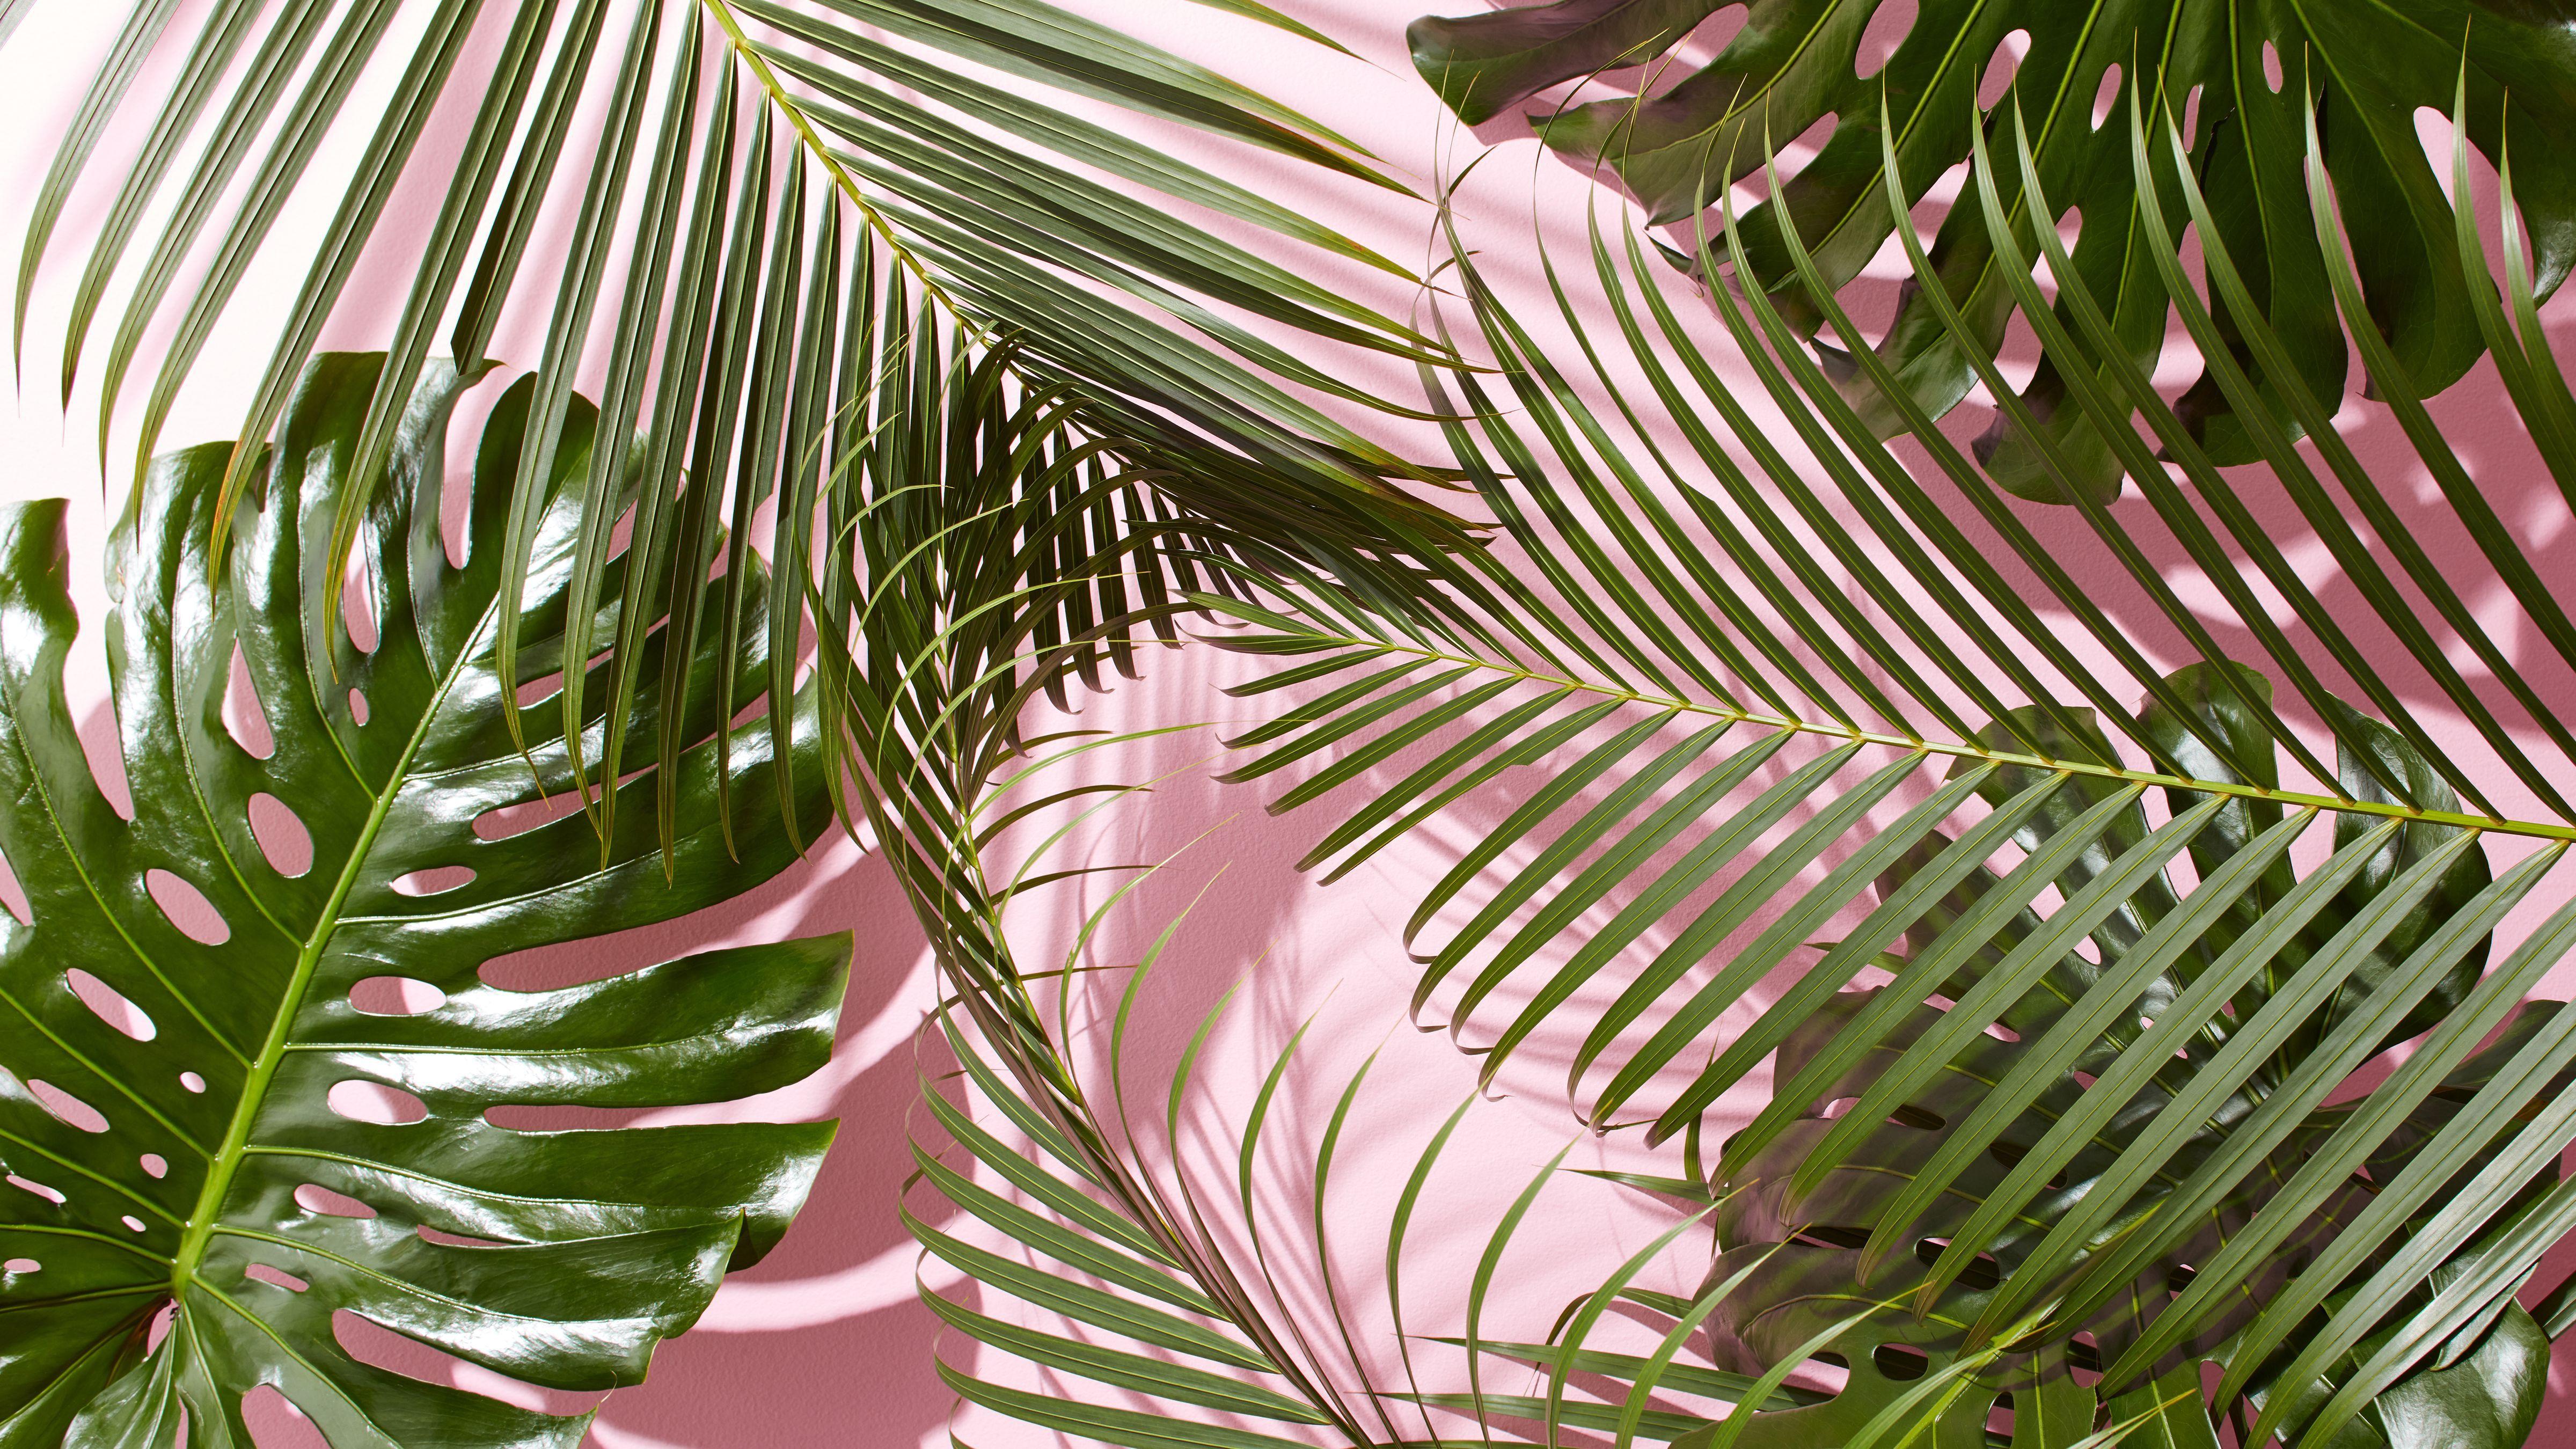 60 Tropical Leaves Desktop Wallpapers Download At Wallpaperbro Laptop Wallpaper Desktop Wallpapers Cute Desktop Wallpaper Plant Wallpaper